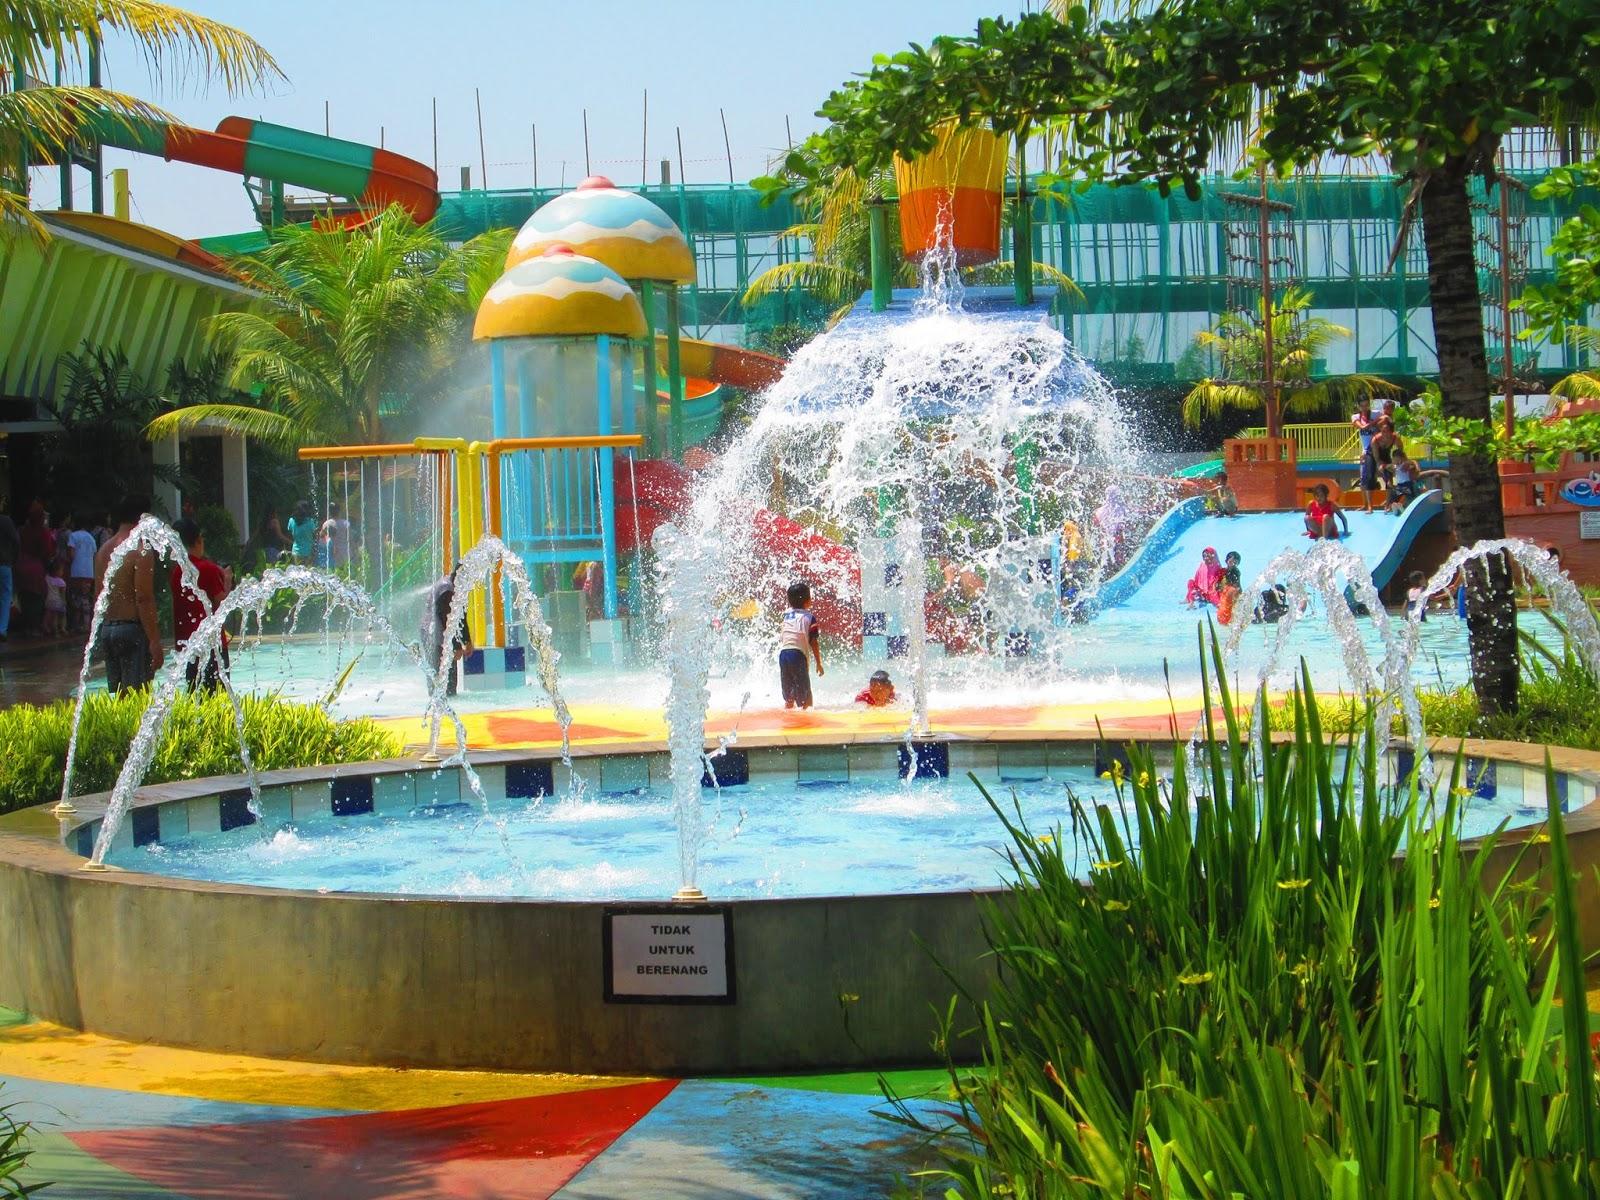 International Conference Biodiversity Waterboom Sukoharjo Fountain Water Park Kab Semarang